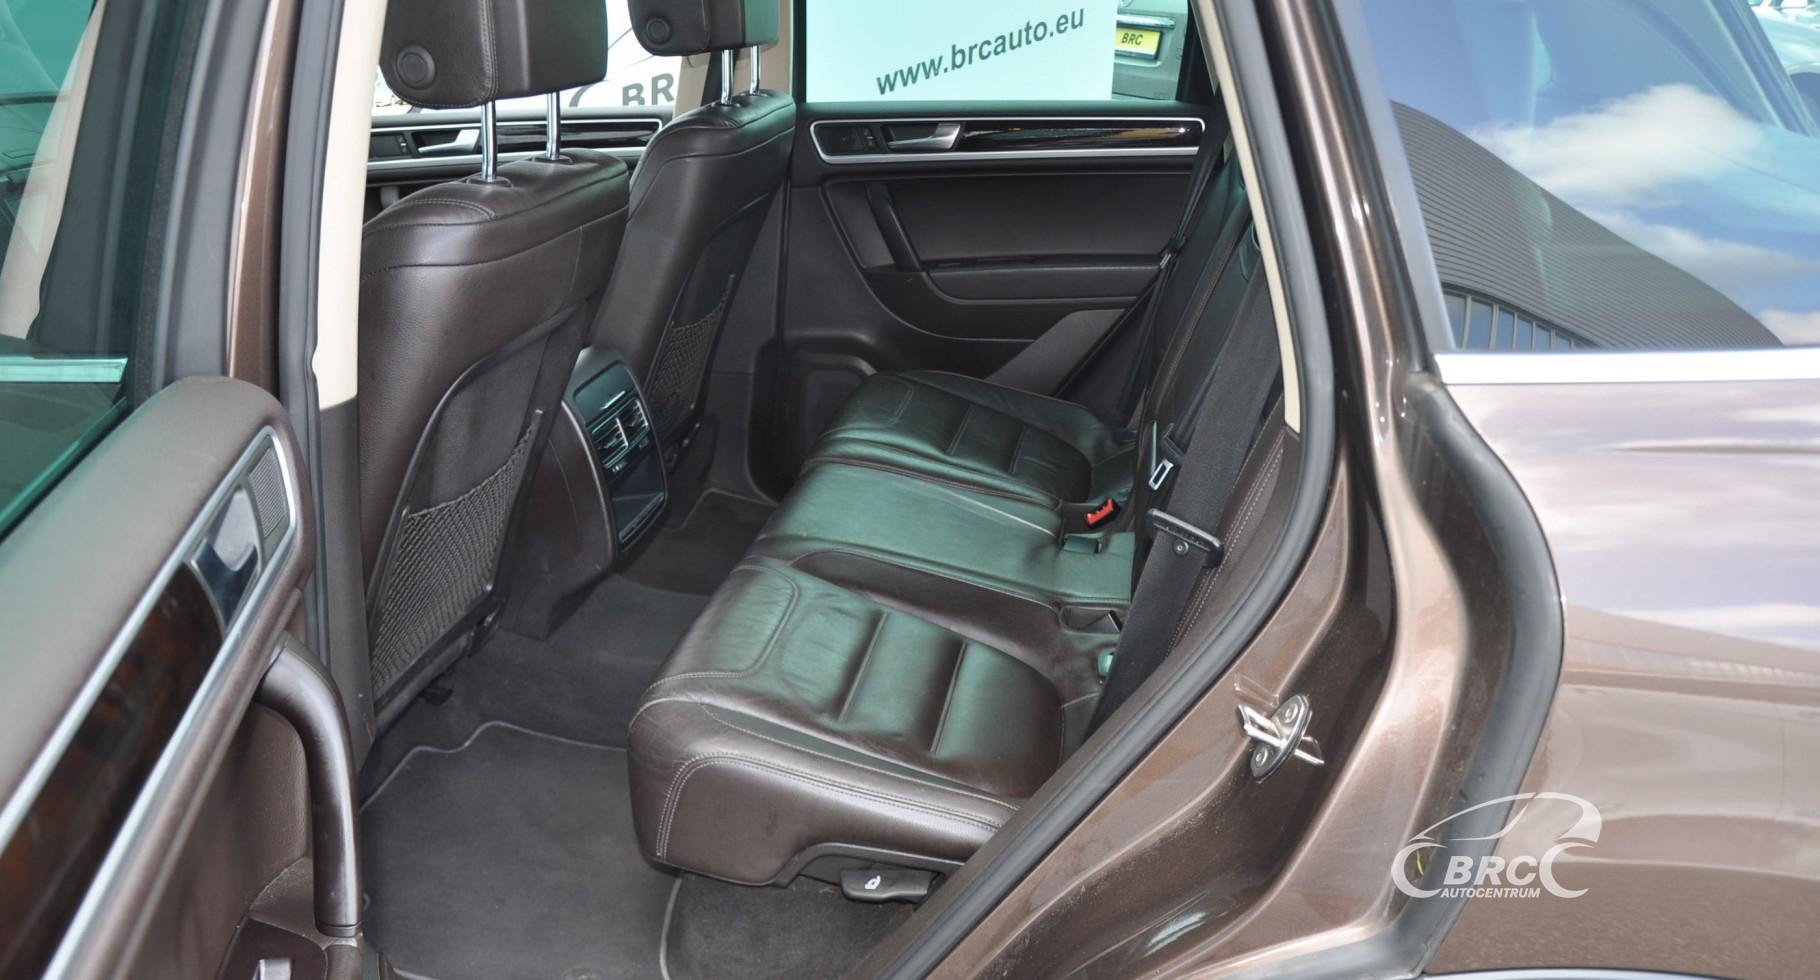 Volkswagen Touareg 3.0 V6 TDI 4MOTION Automatas